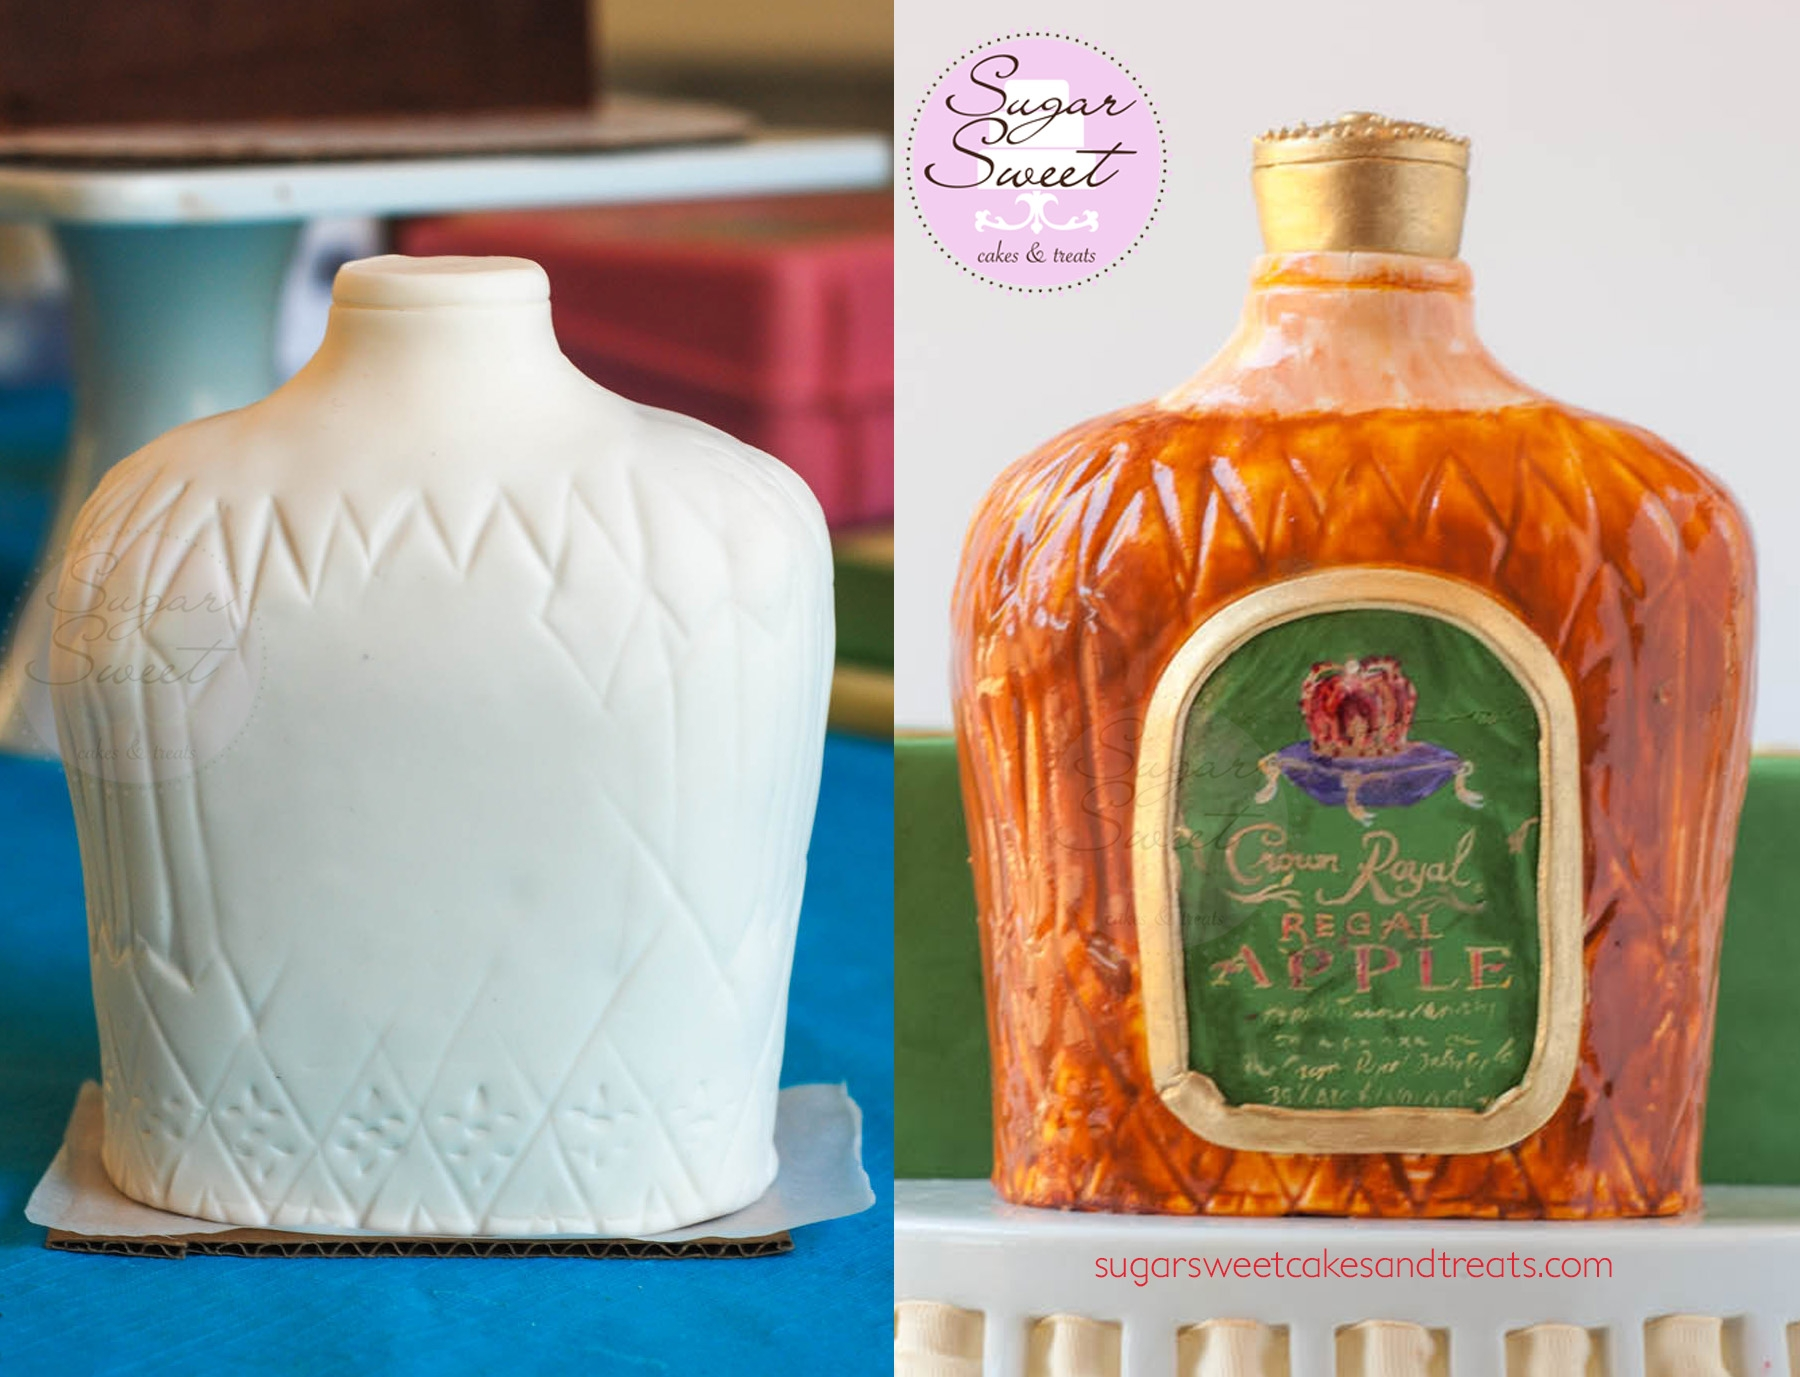 Green Apple Crown Royal Cake